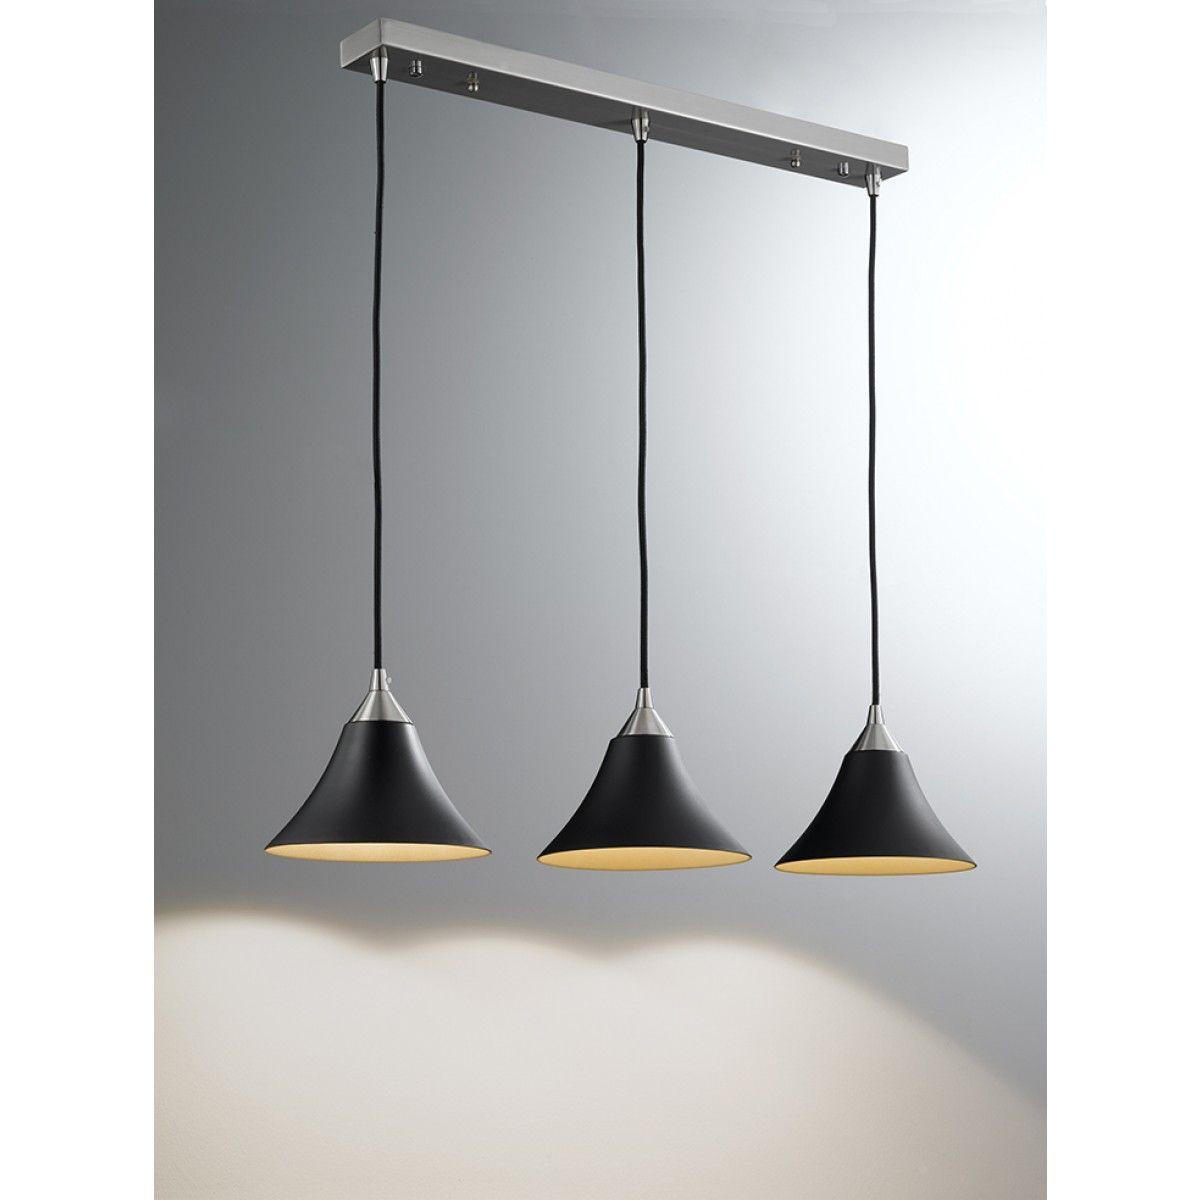 Vetross suspension cw 3 x blackgold colour glasses kitchen vetross suspension cw 3 x blackgold colour glasses pendant lighting ceiling lights aloadofball Gallery